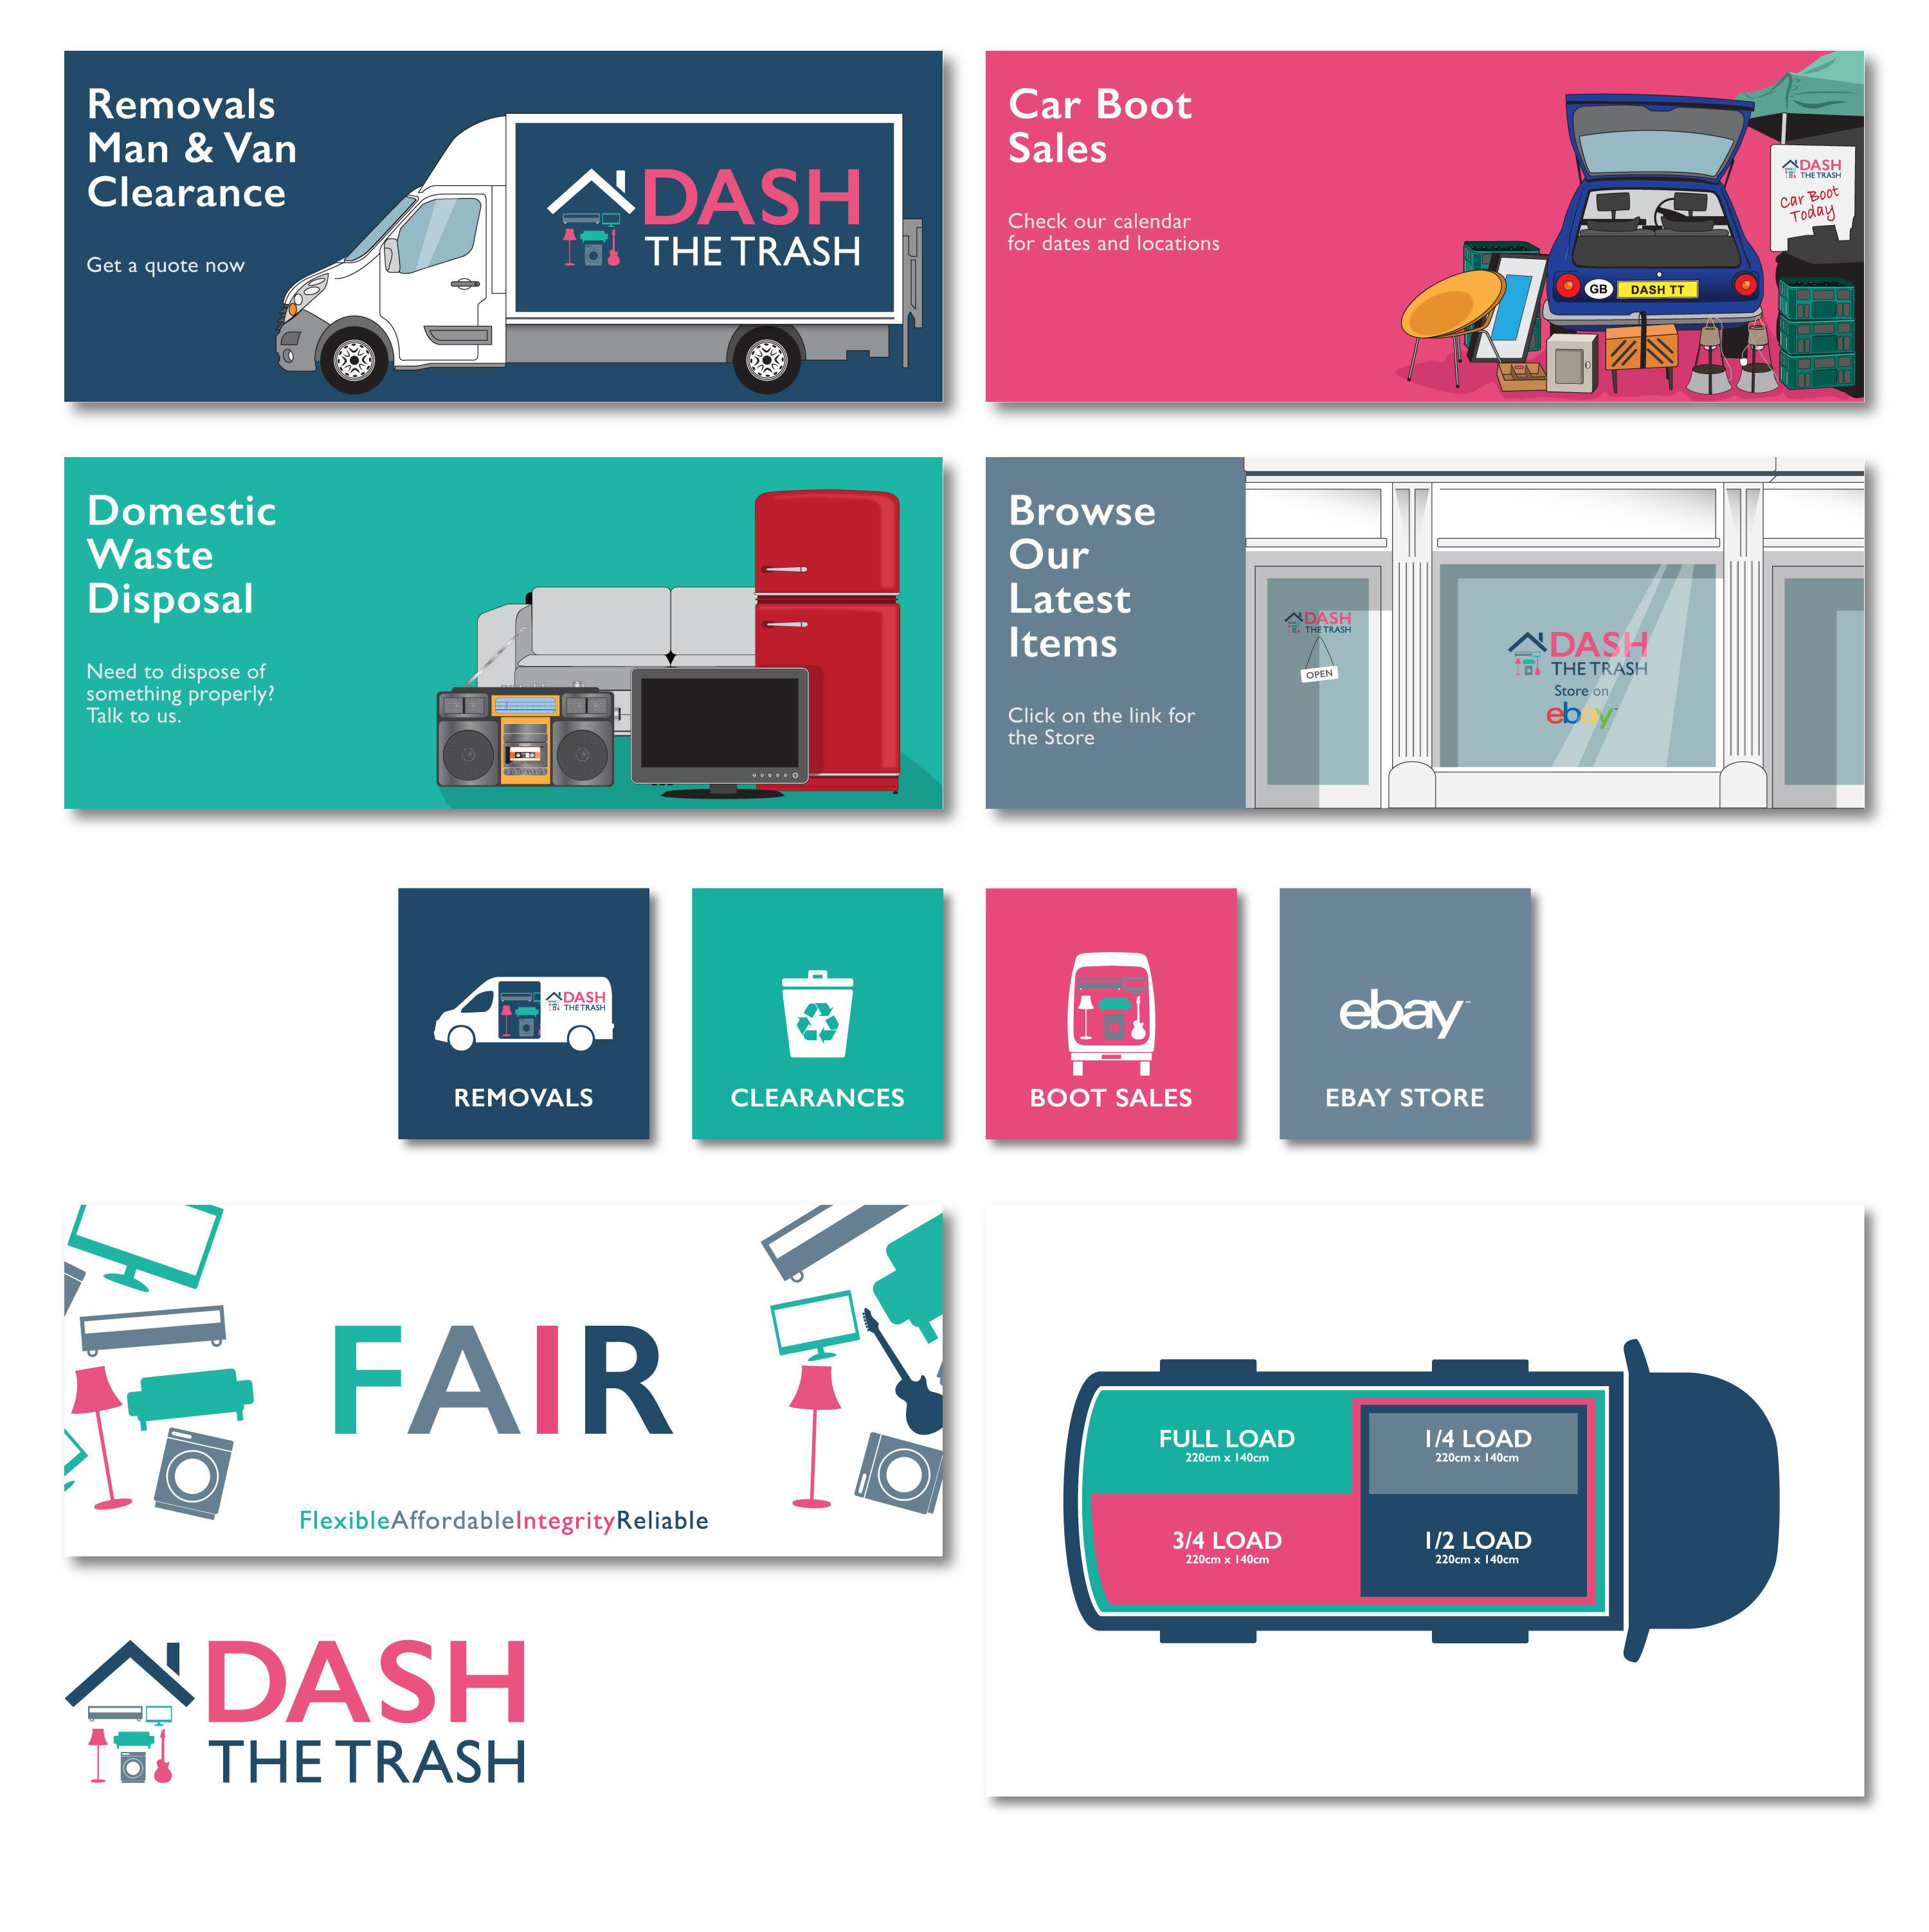 dashthetrash-banners-icons